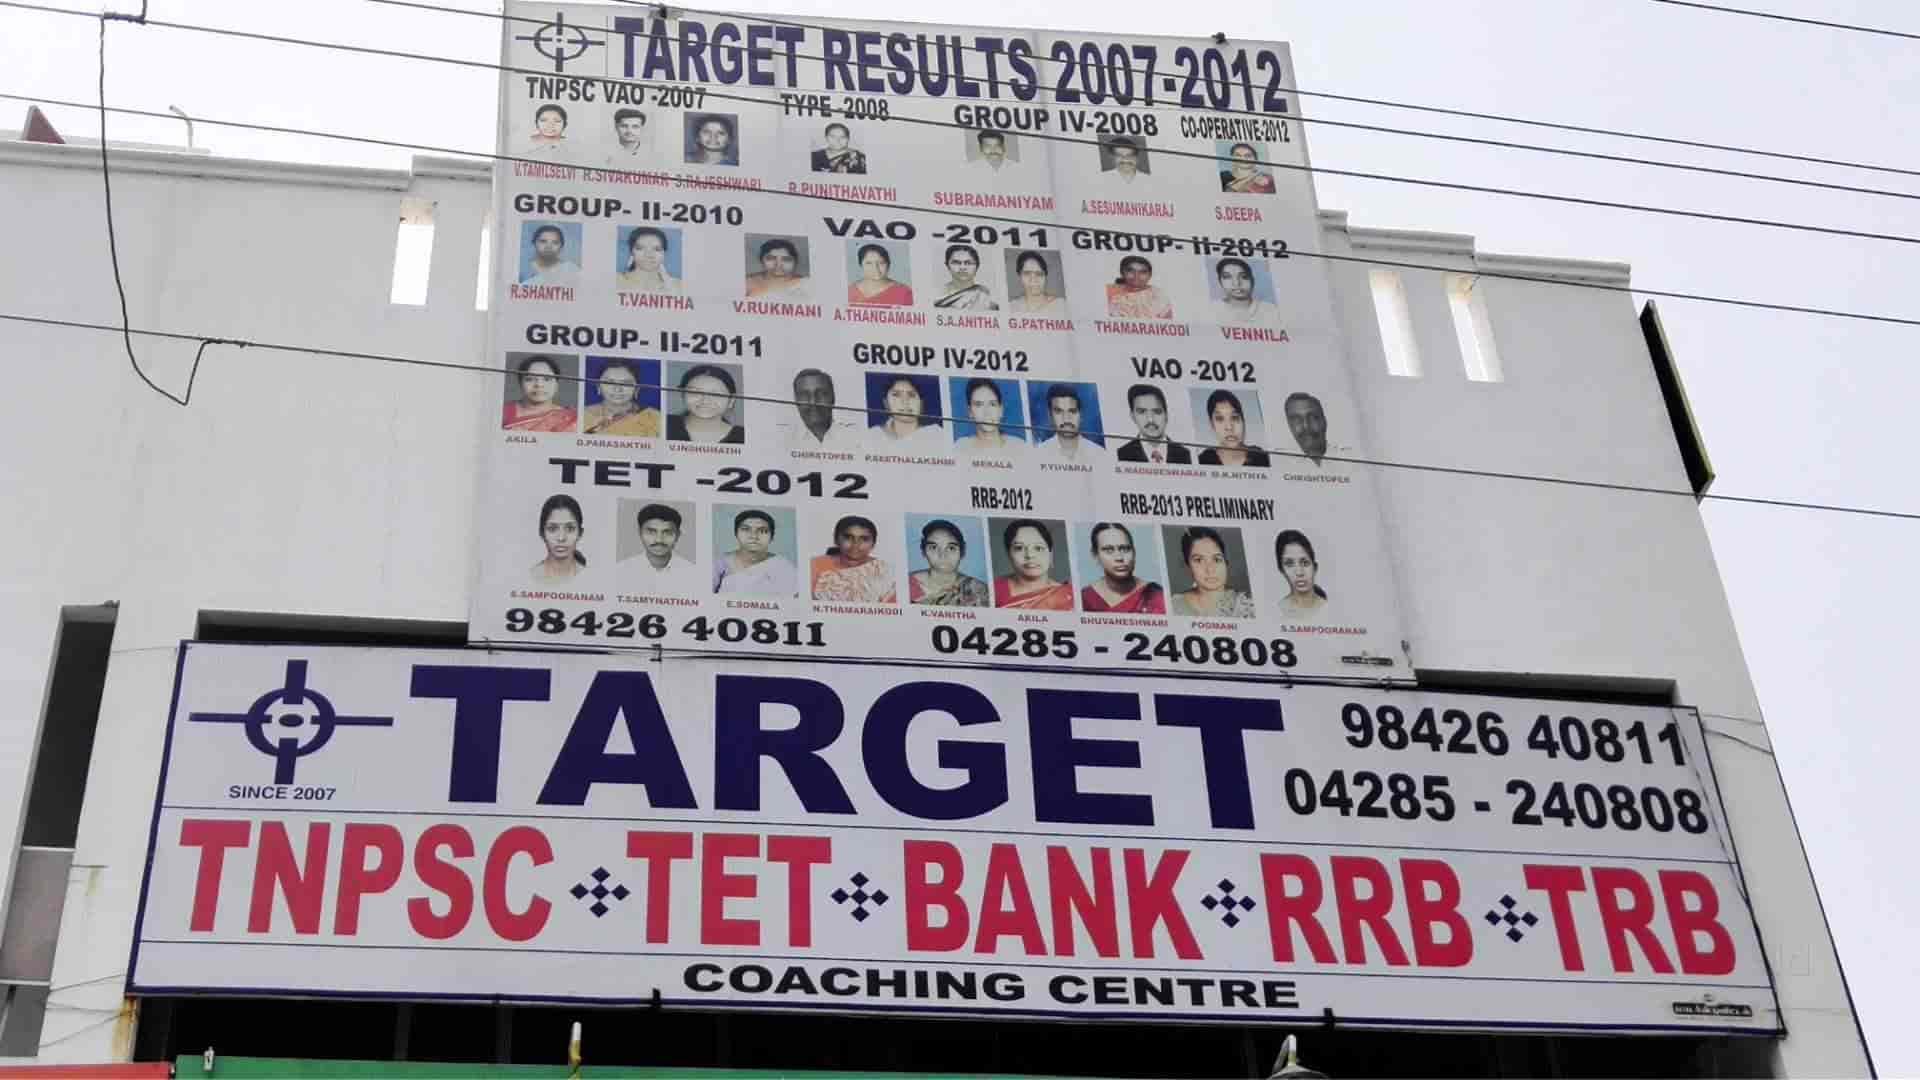 Target Academy Abi Hospital Near Tutorials In Gobichettipalayam Justdial